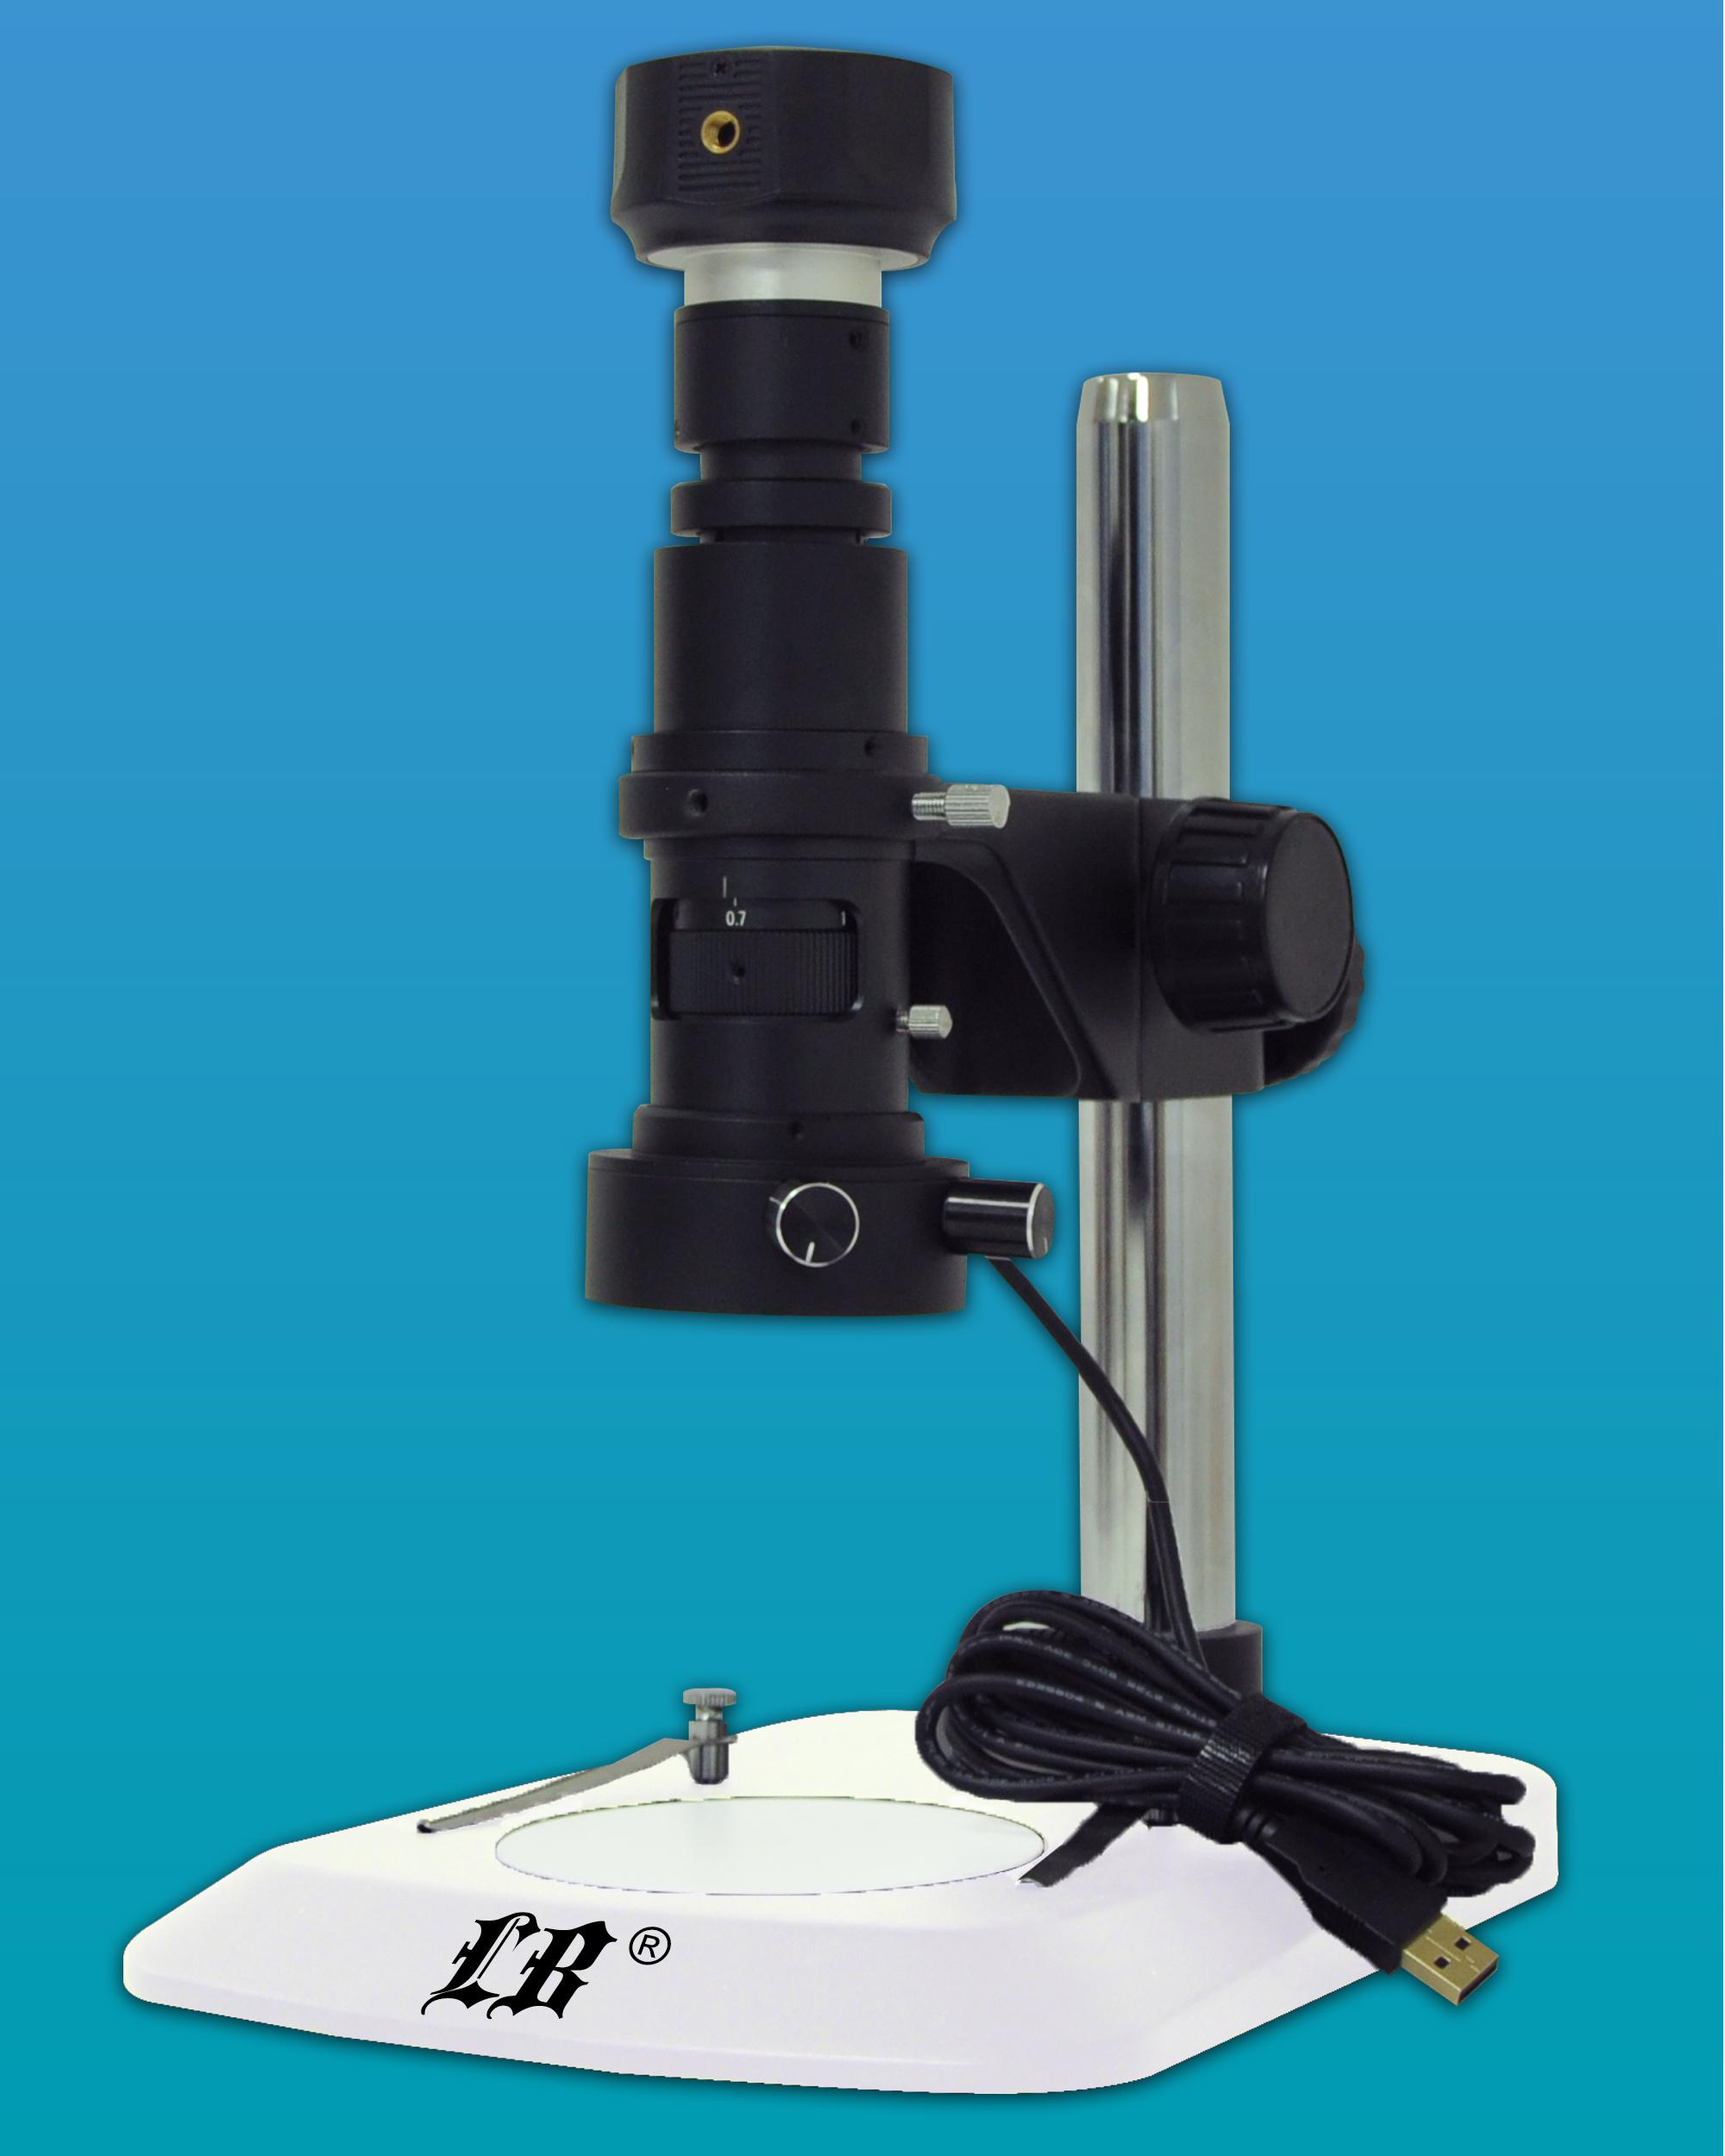 [LB-102] Digital Monocular Microscope w/ USB2.0 Digital Camera(5.0MP)